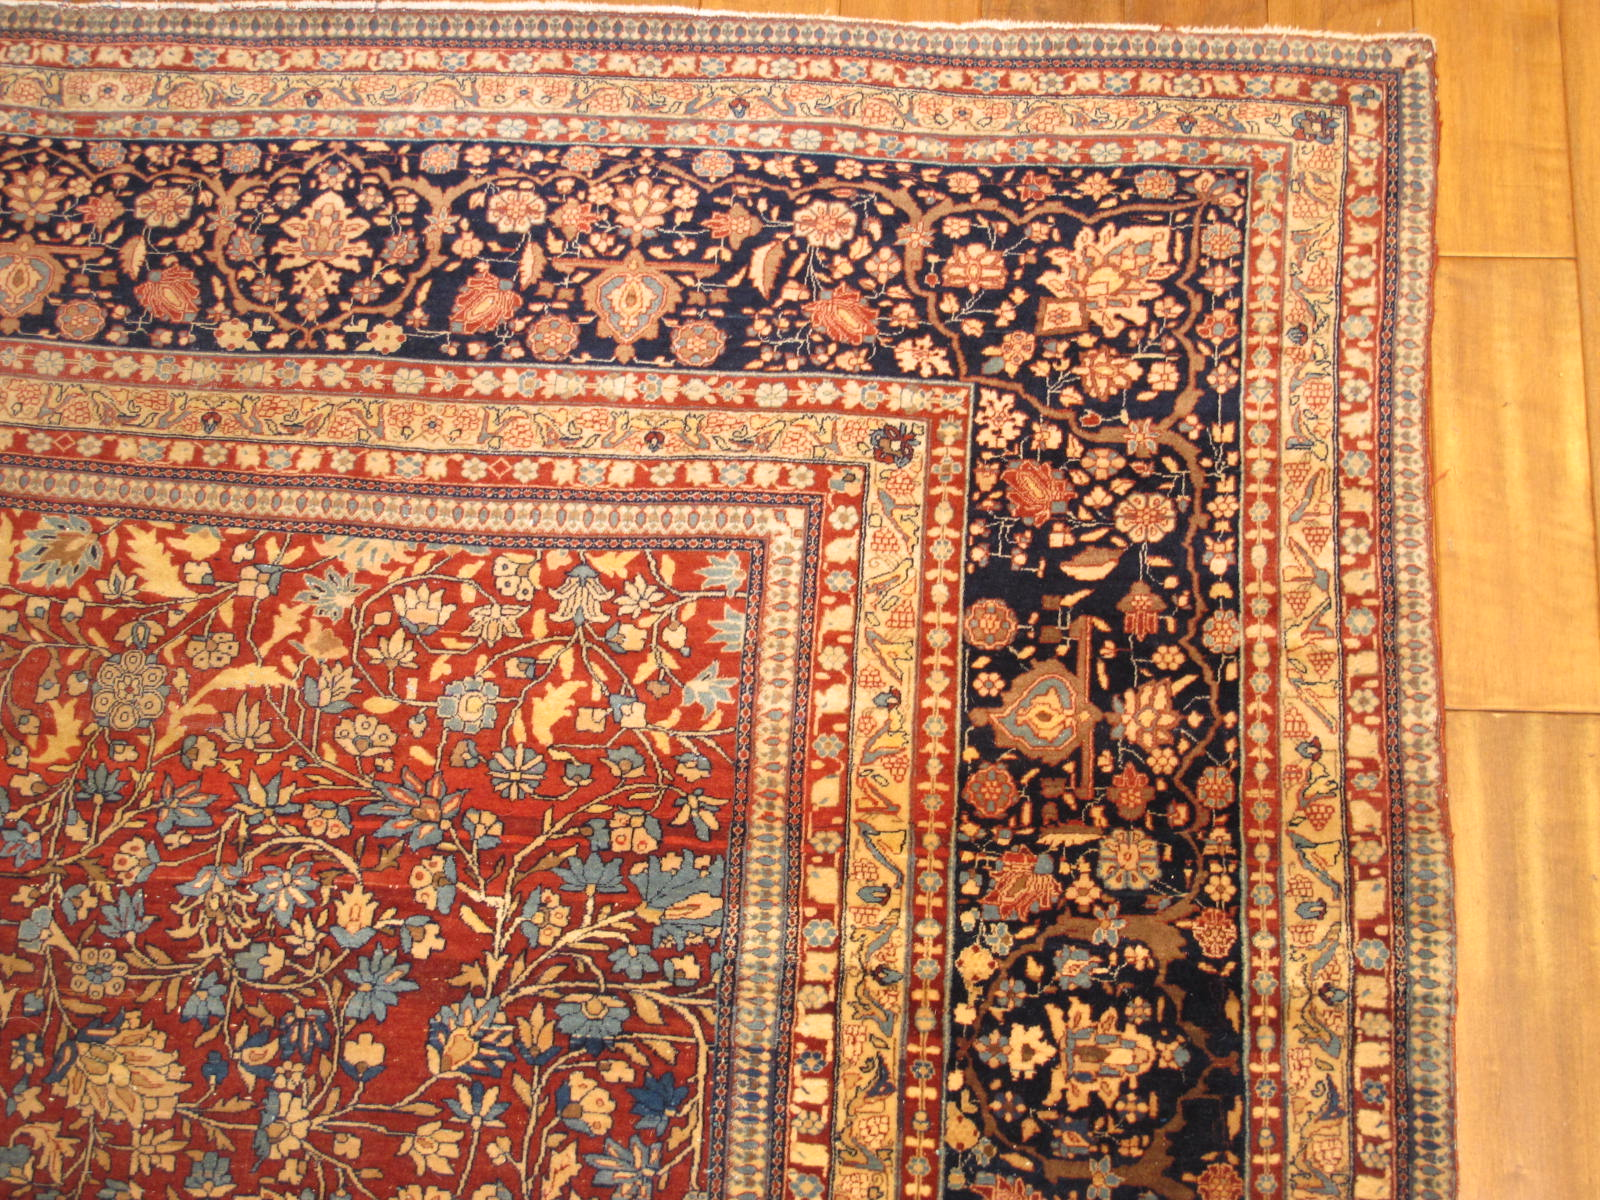 23204 antique persian kashan mohtasham rug 8,3 x 11,1 (2)